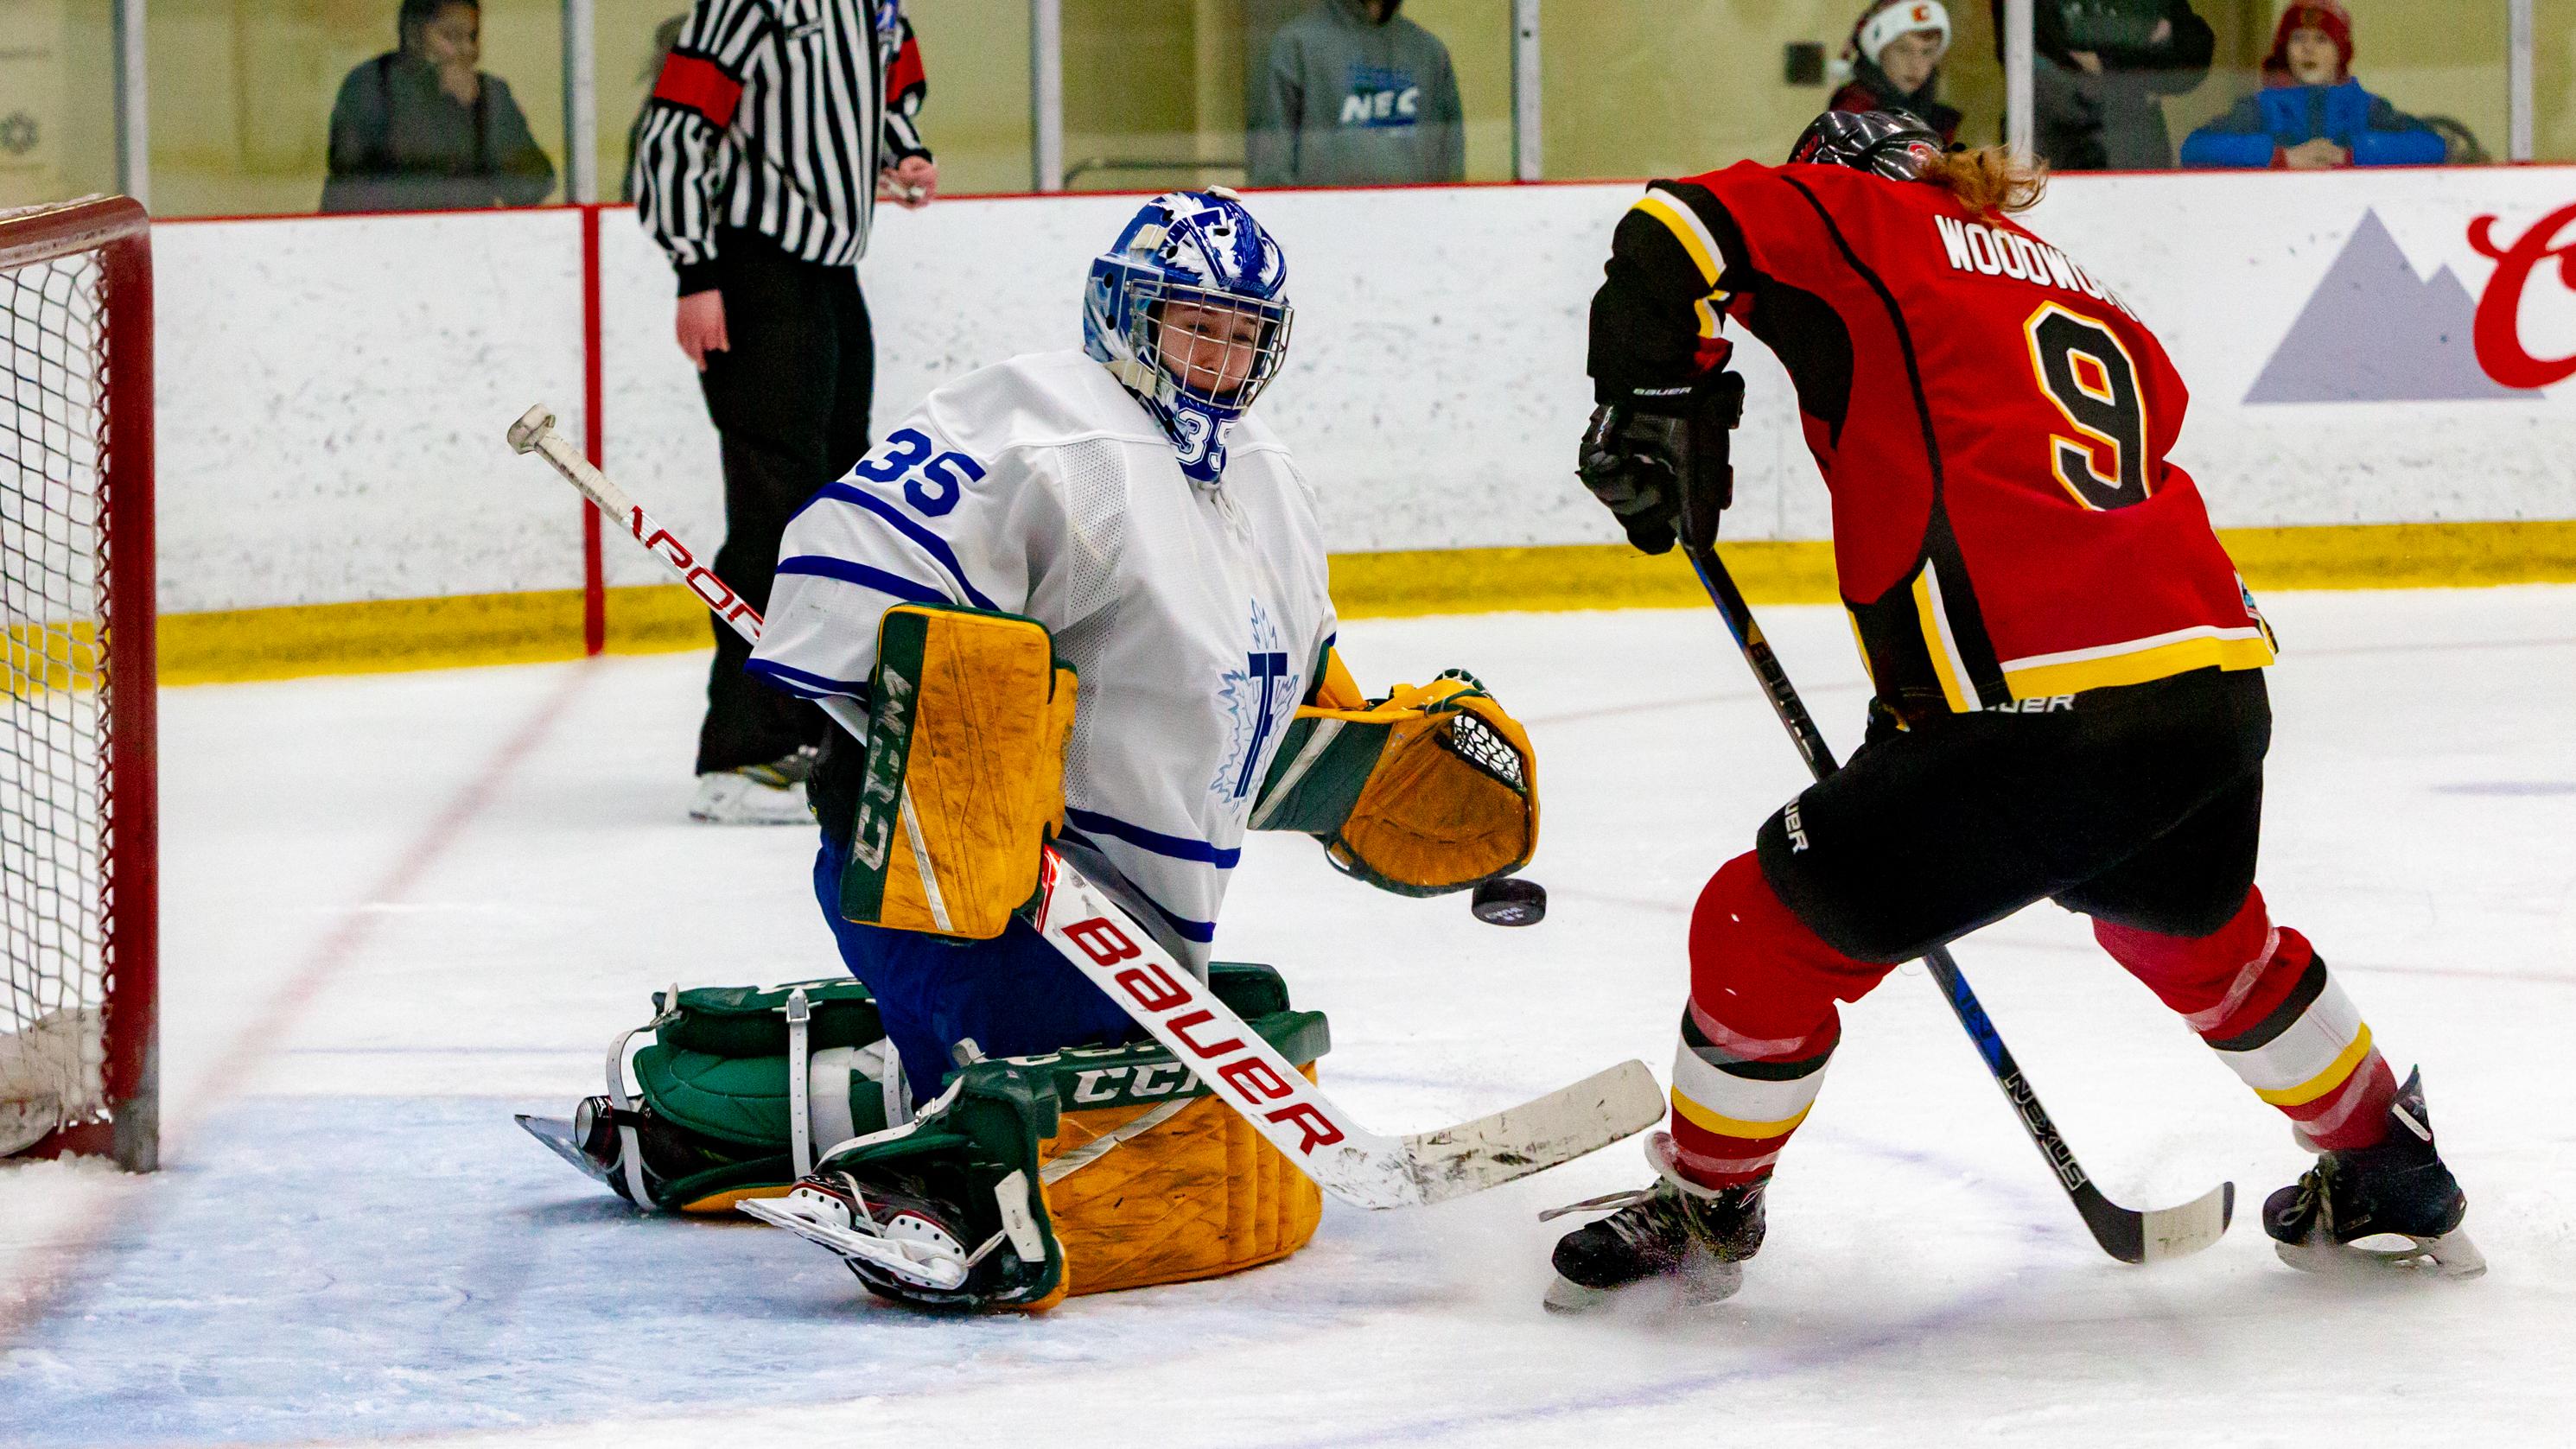 Shea Tiley of the Toronto Furies makes a save on Dakota Woodworth of the Calgary Inferno